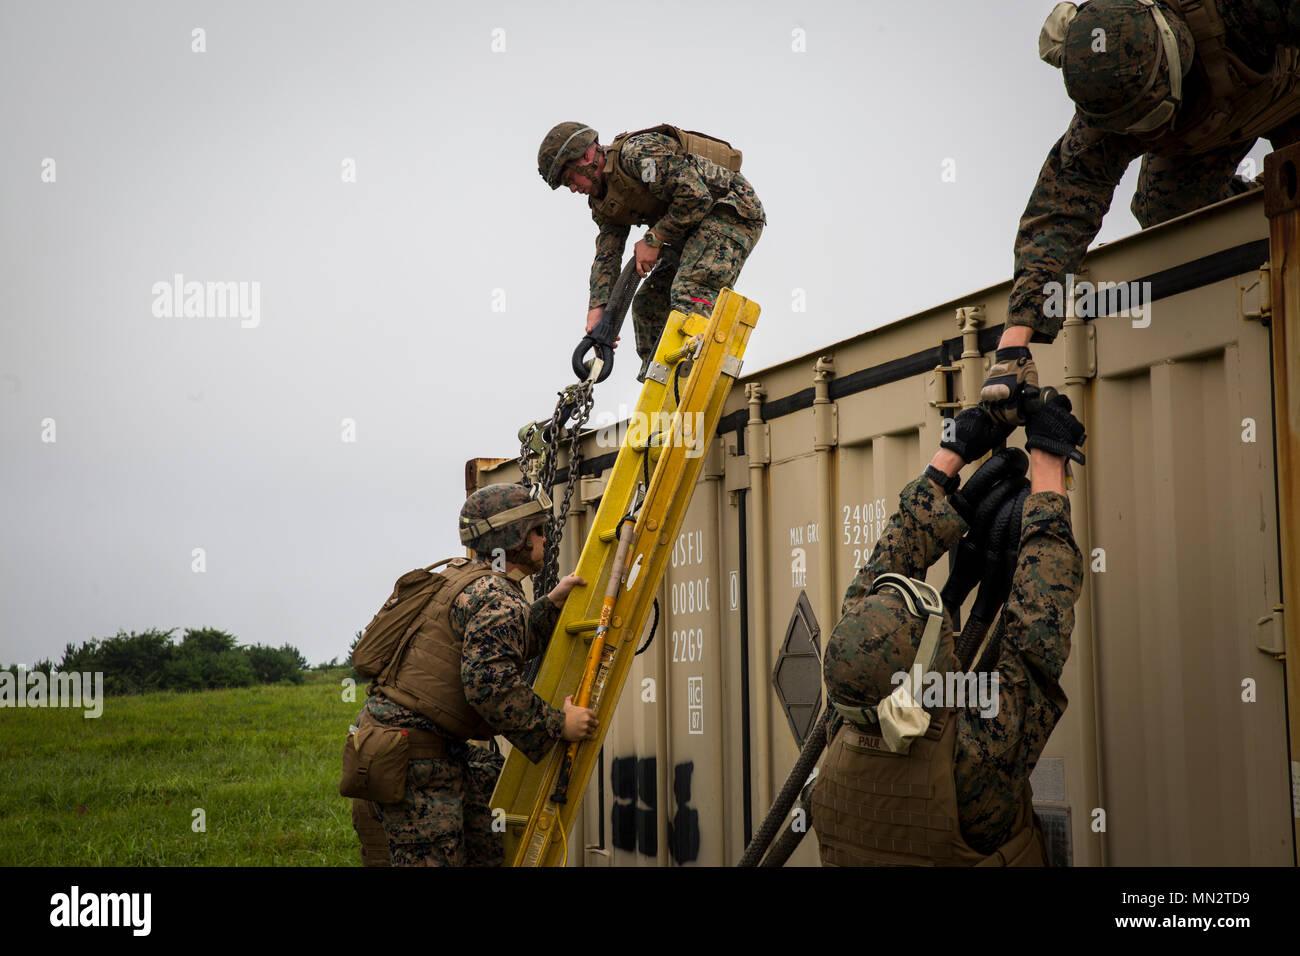 Landing support specialist Marines prepare slings during external